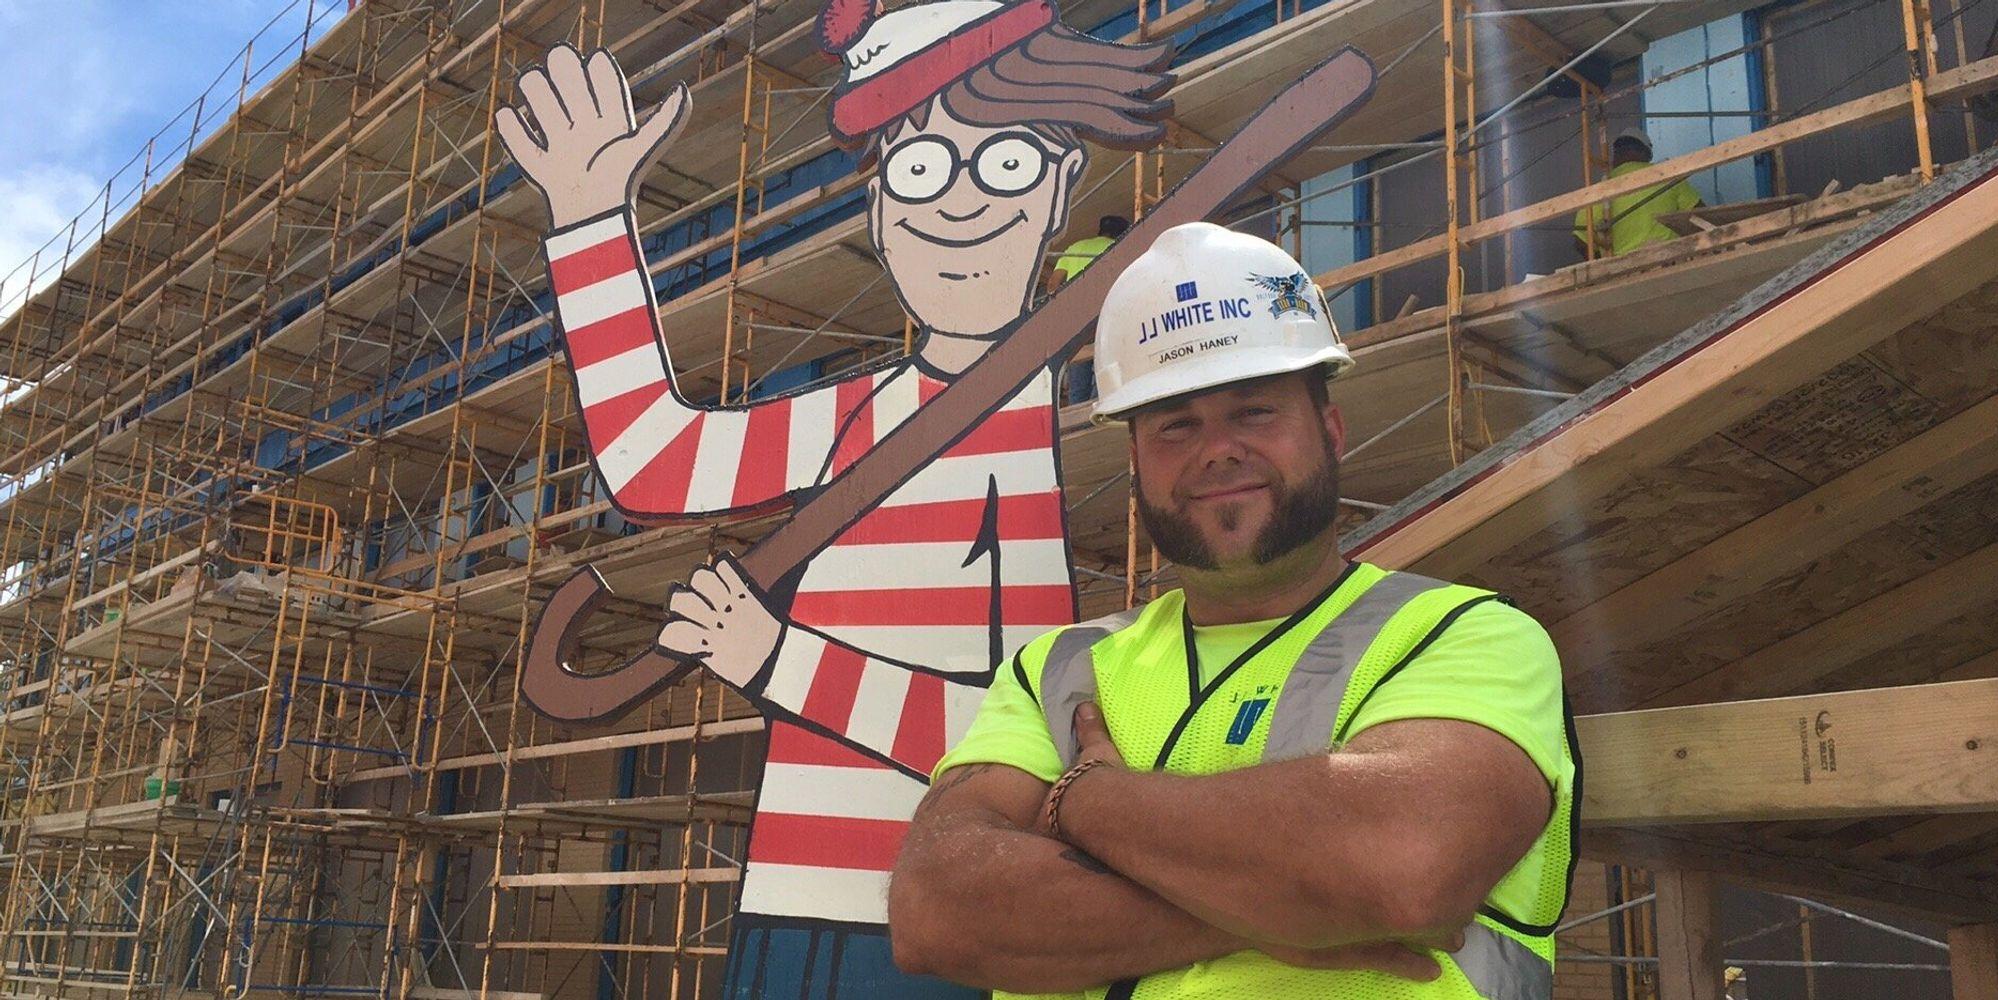 Construction Work Hides Waldo On Site For Kids In Hospital Next Door